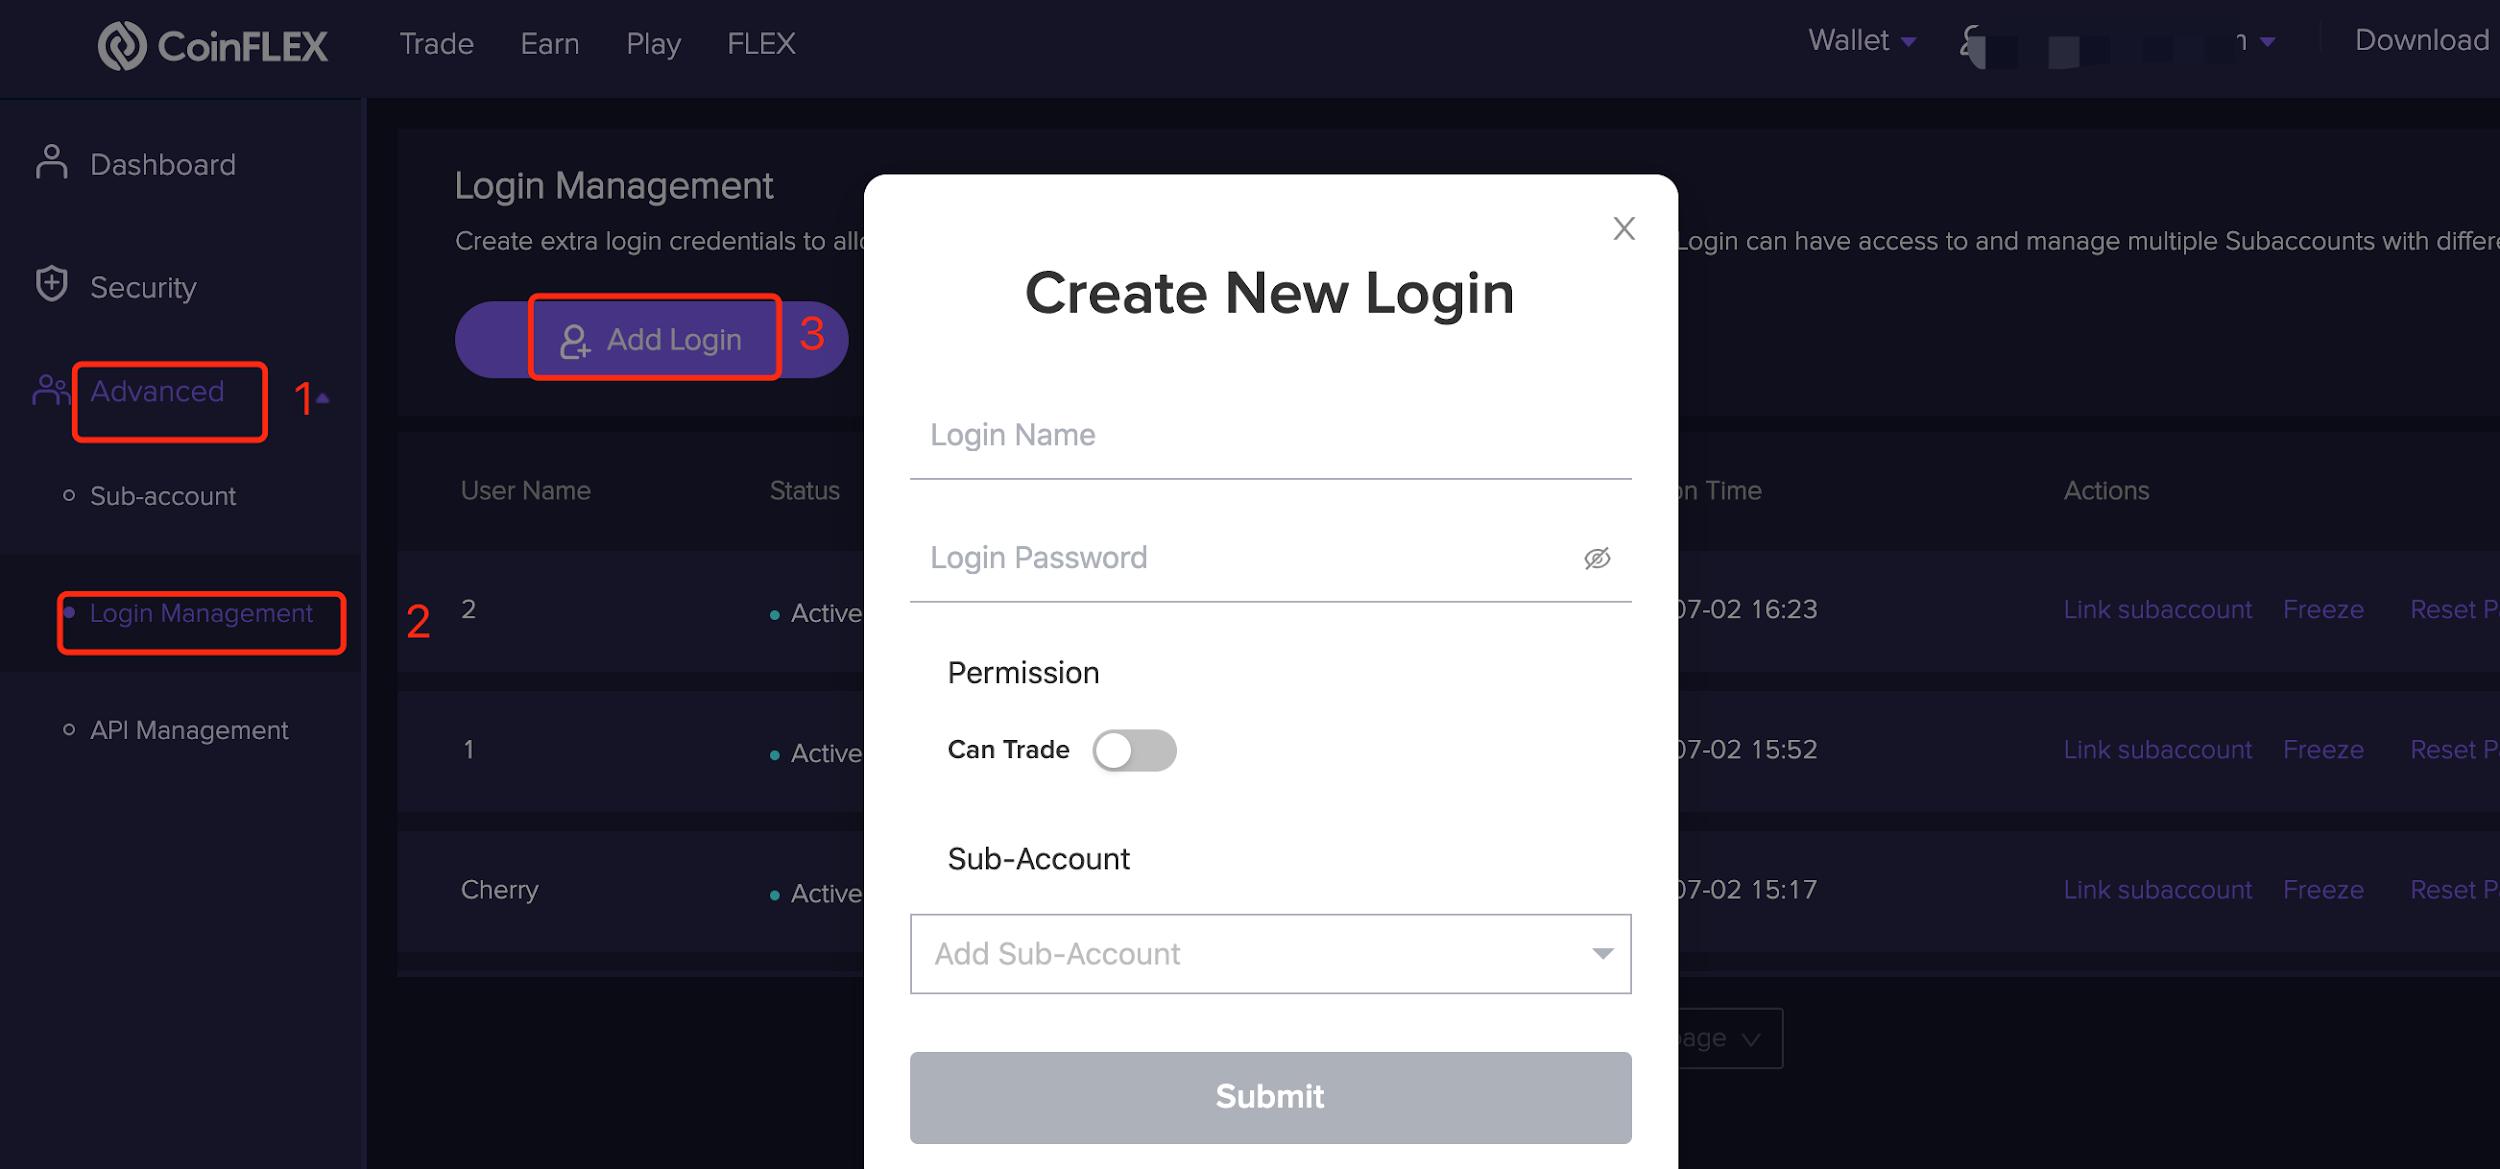 Create new login 1.1.13 Login account creation